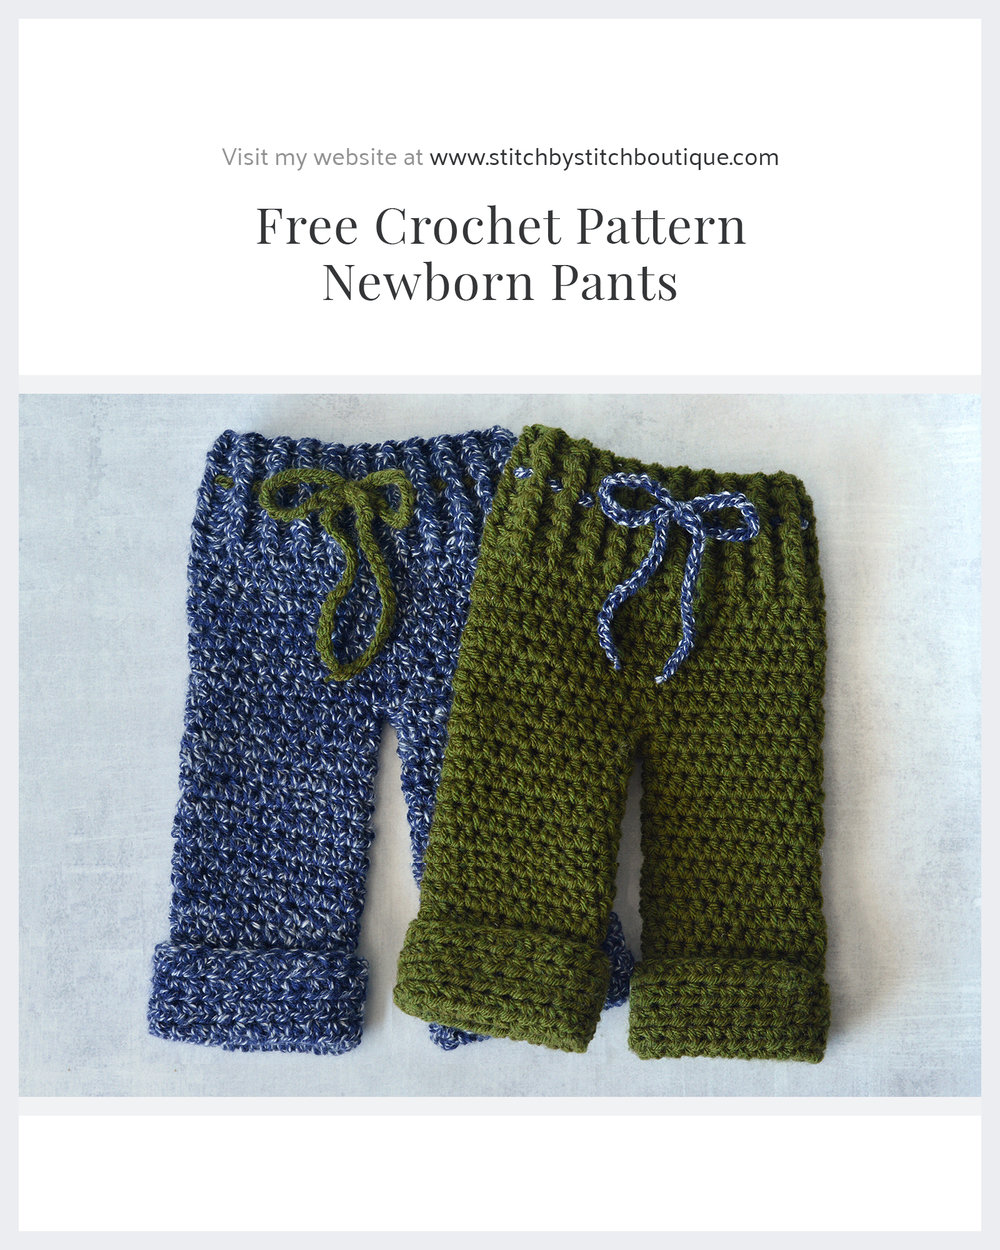 Free Crochet Newborn Pants Pattern